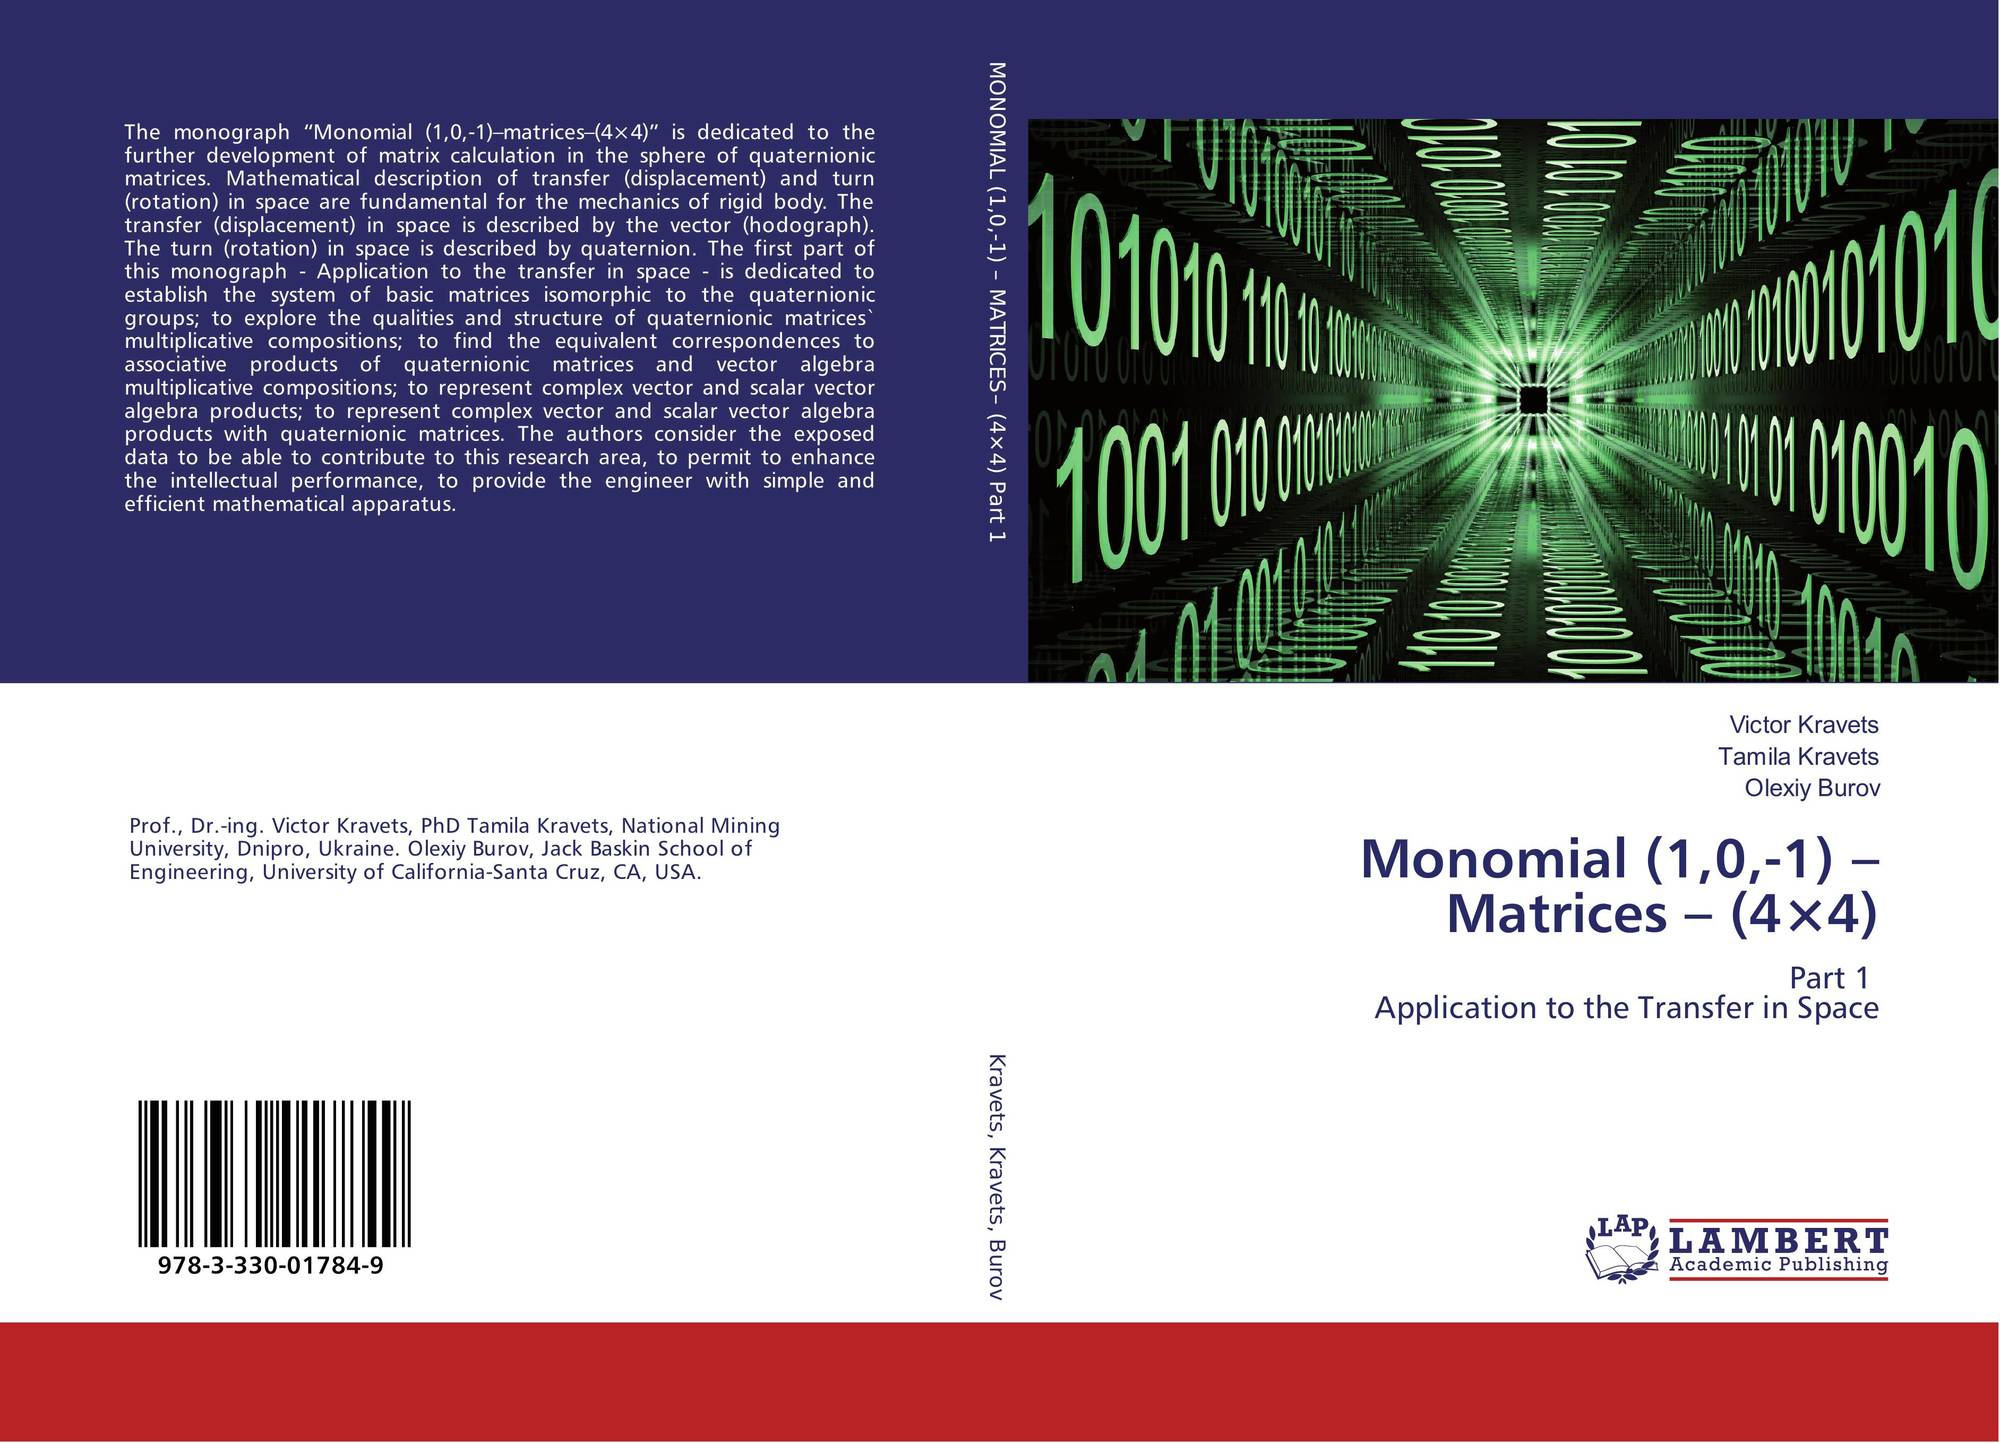 Monomial (1,0,-1) – Matrices – (4×4), 978-3-330-01784-9